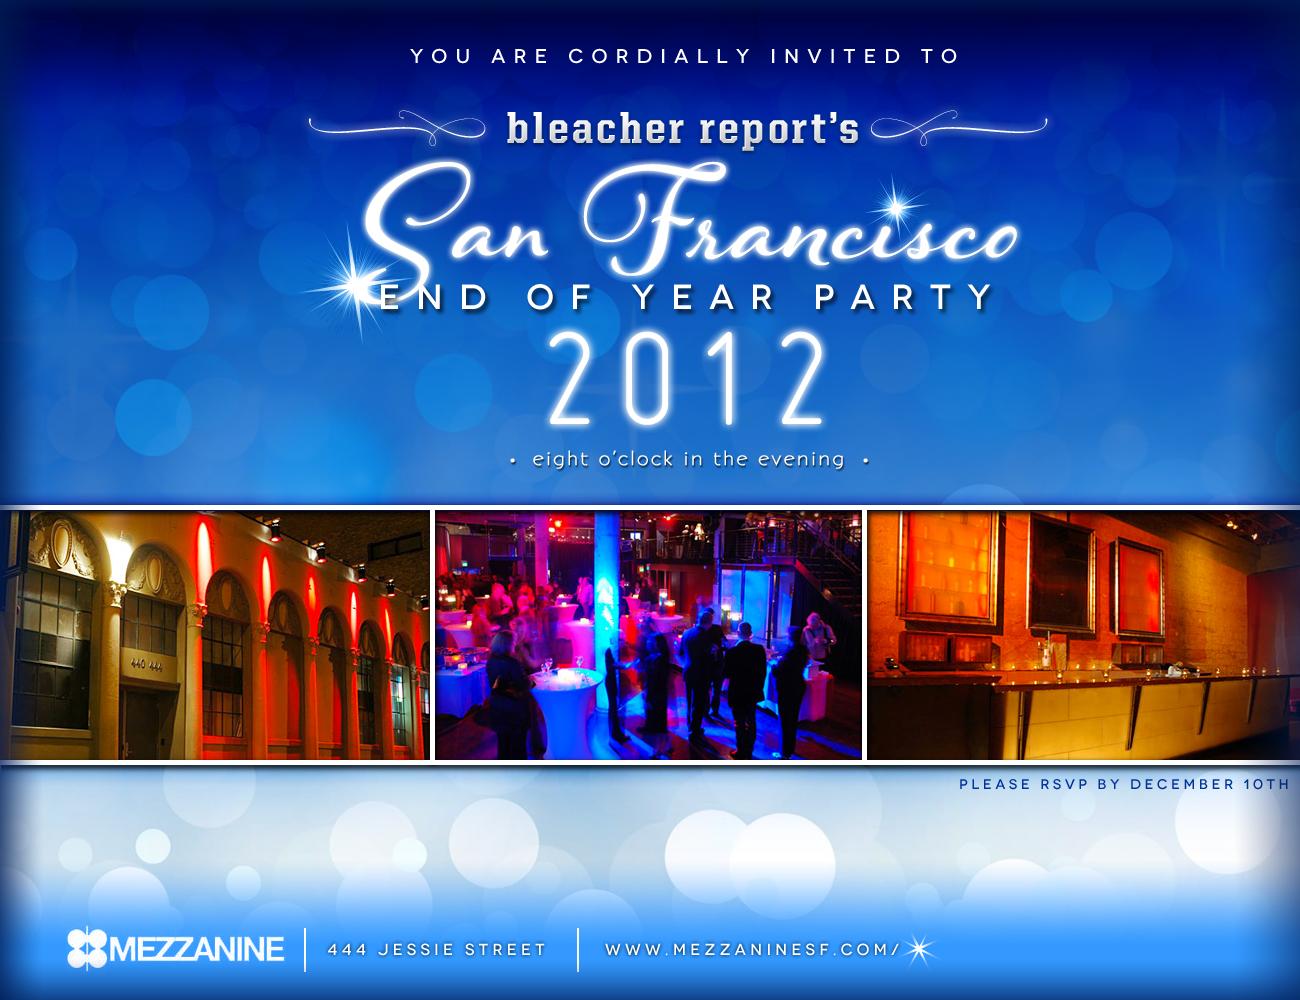 invite_BRholiday_Mezzanine2012.jpg